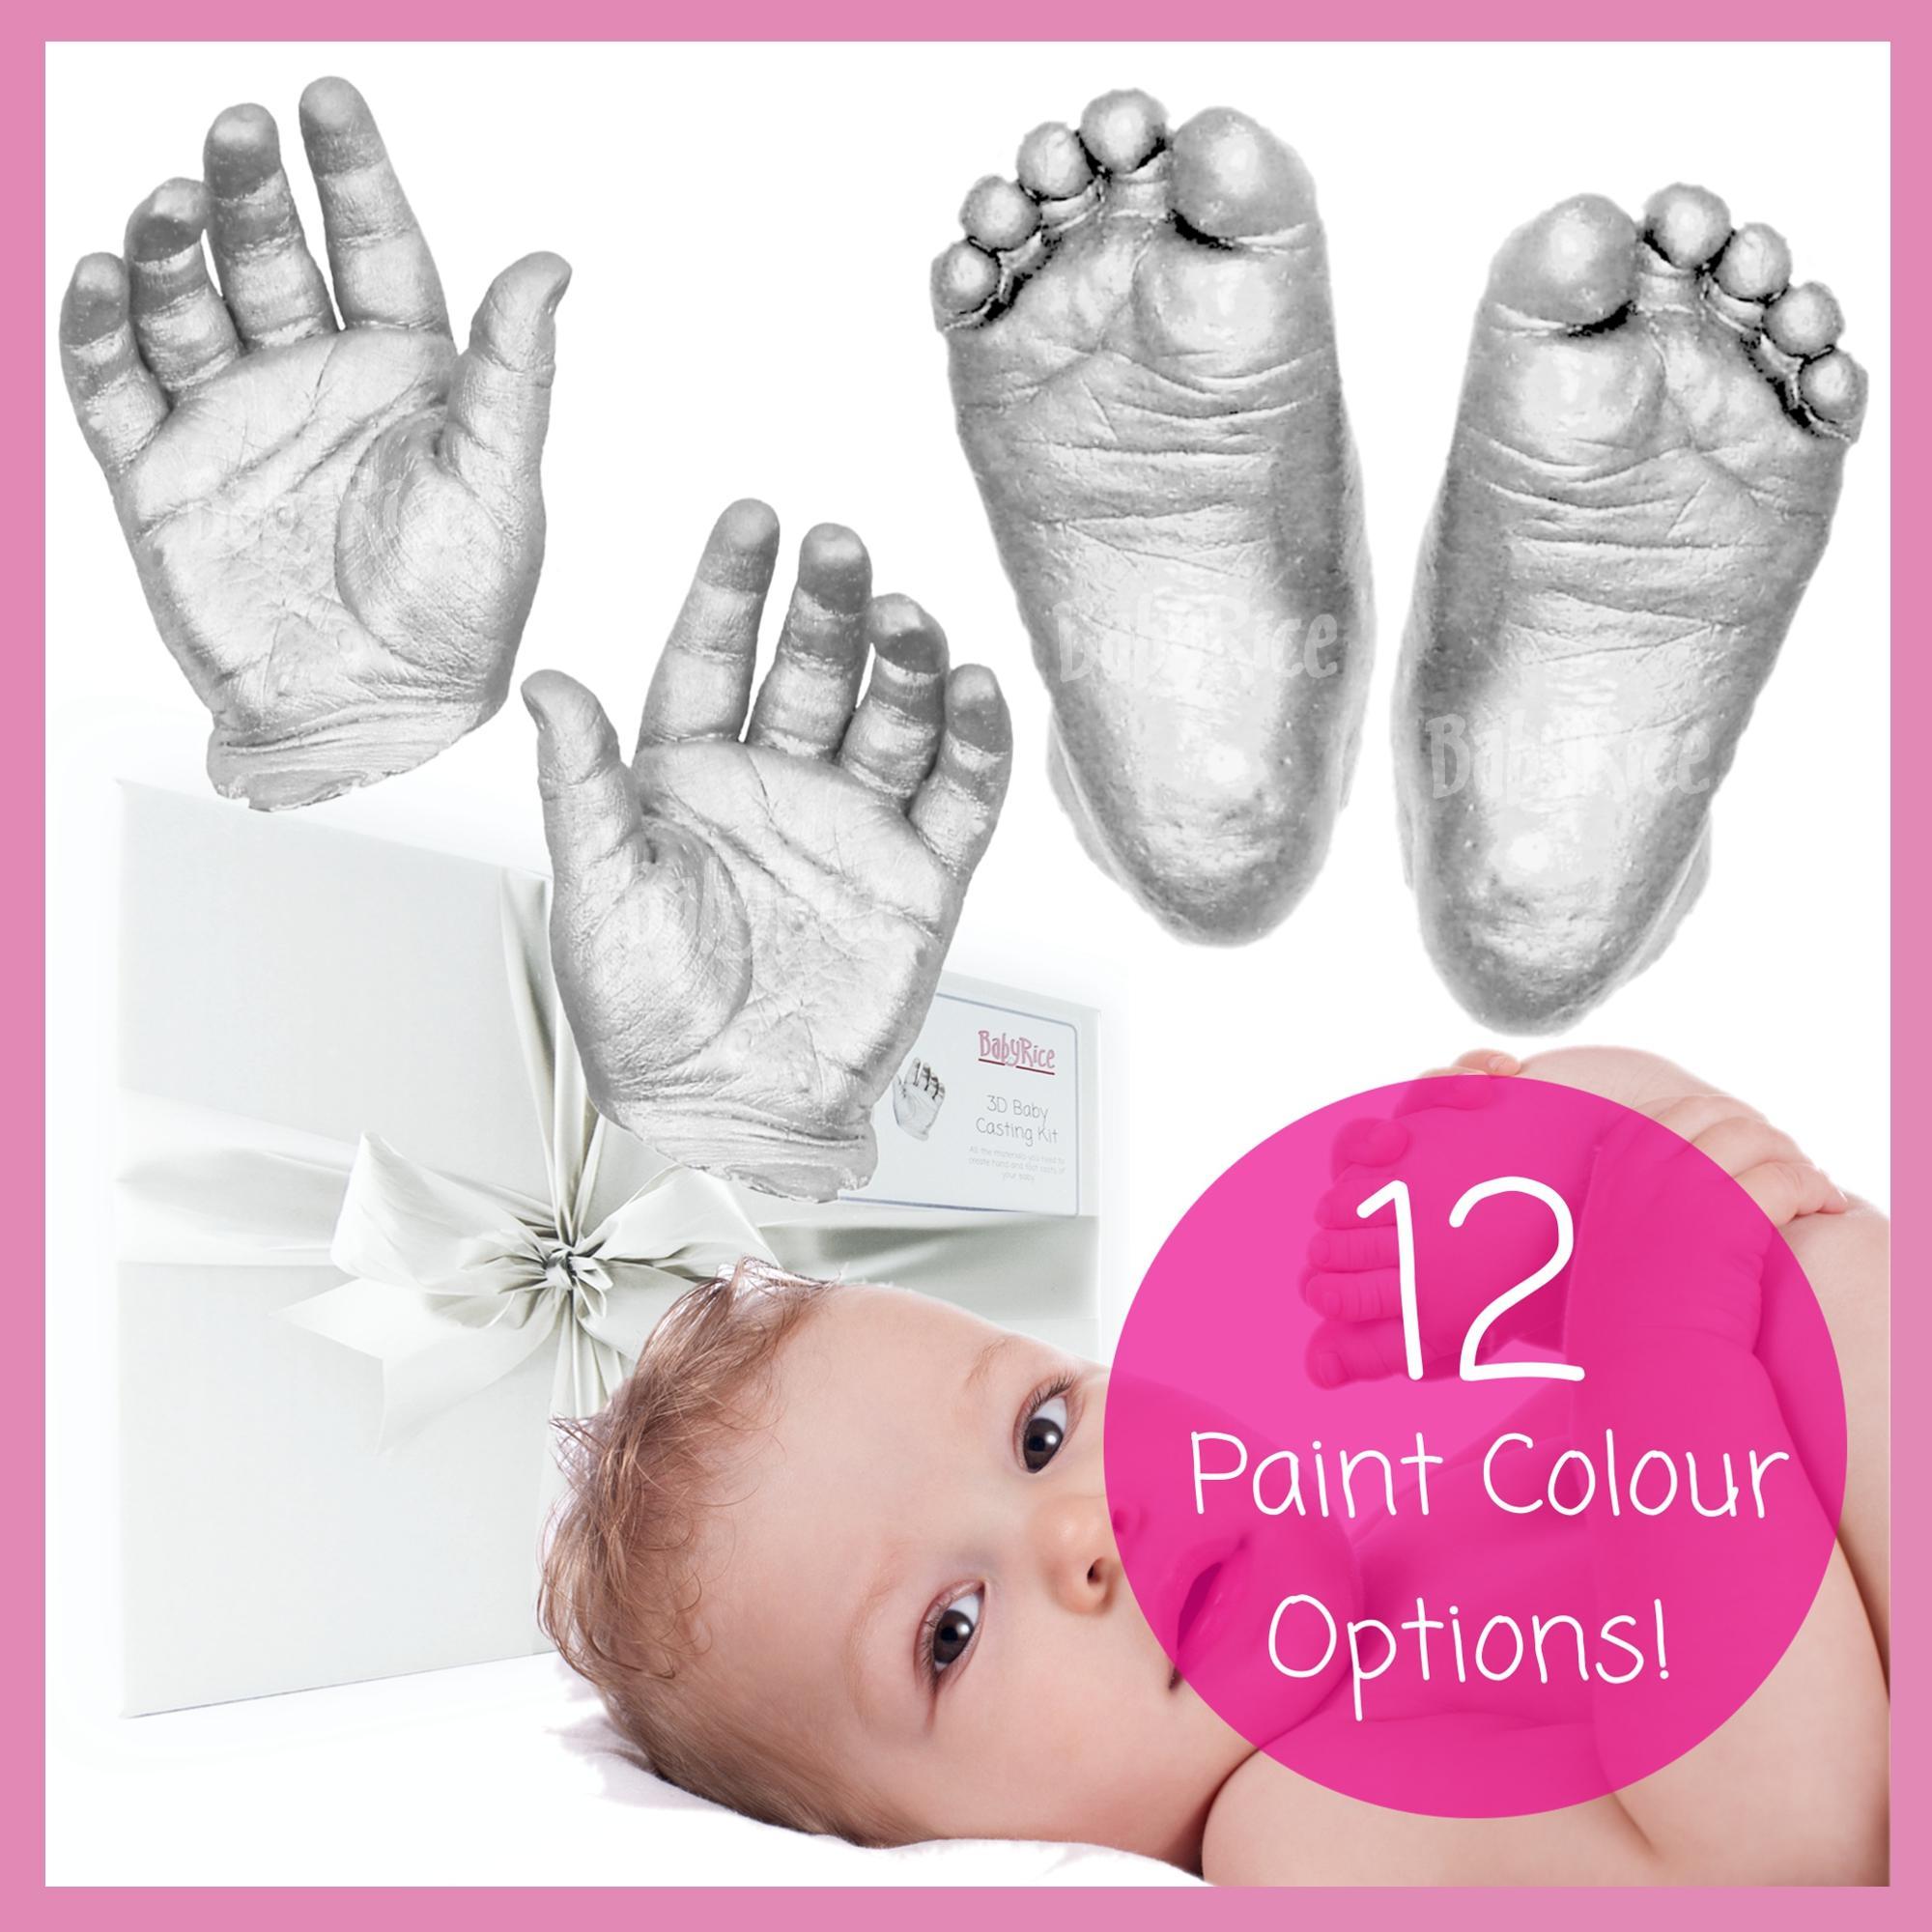 Baby Casting Kits from babyrice.co.uk